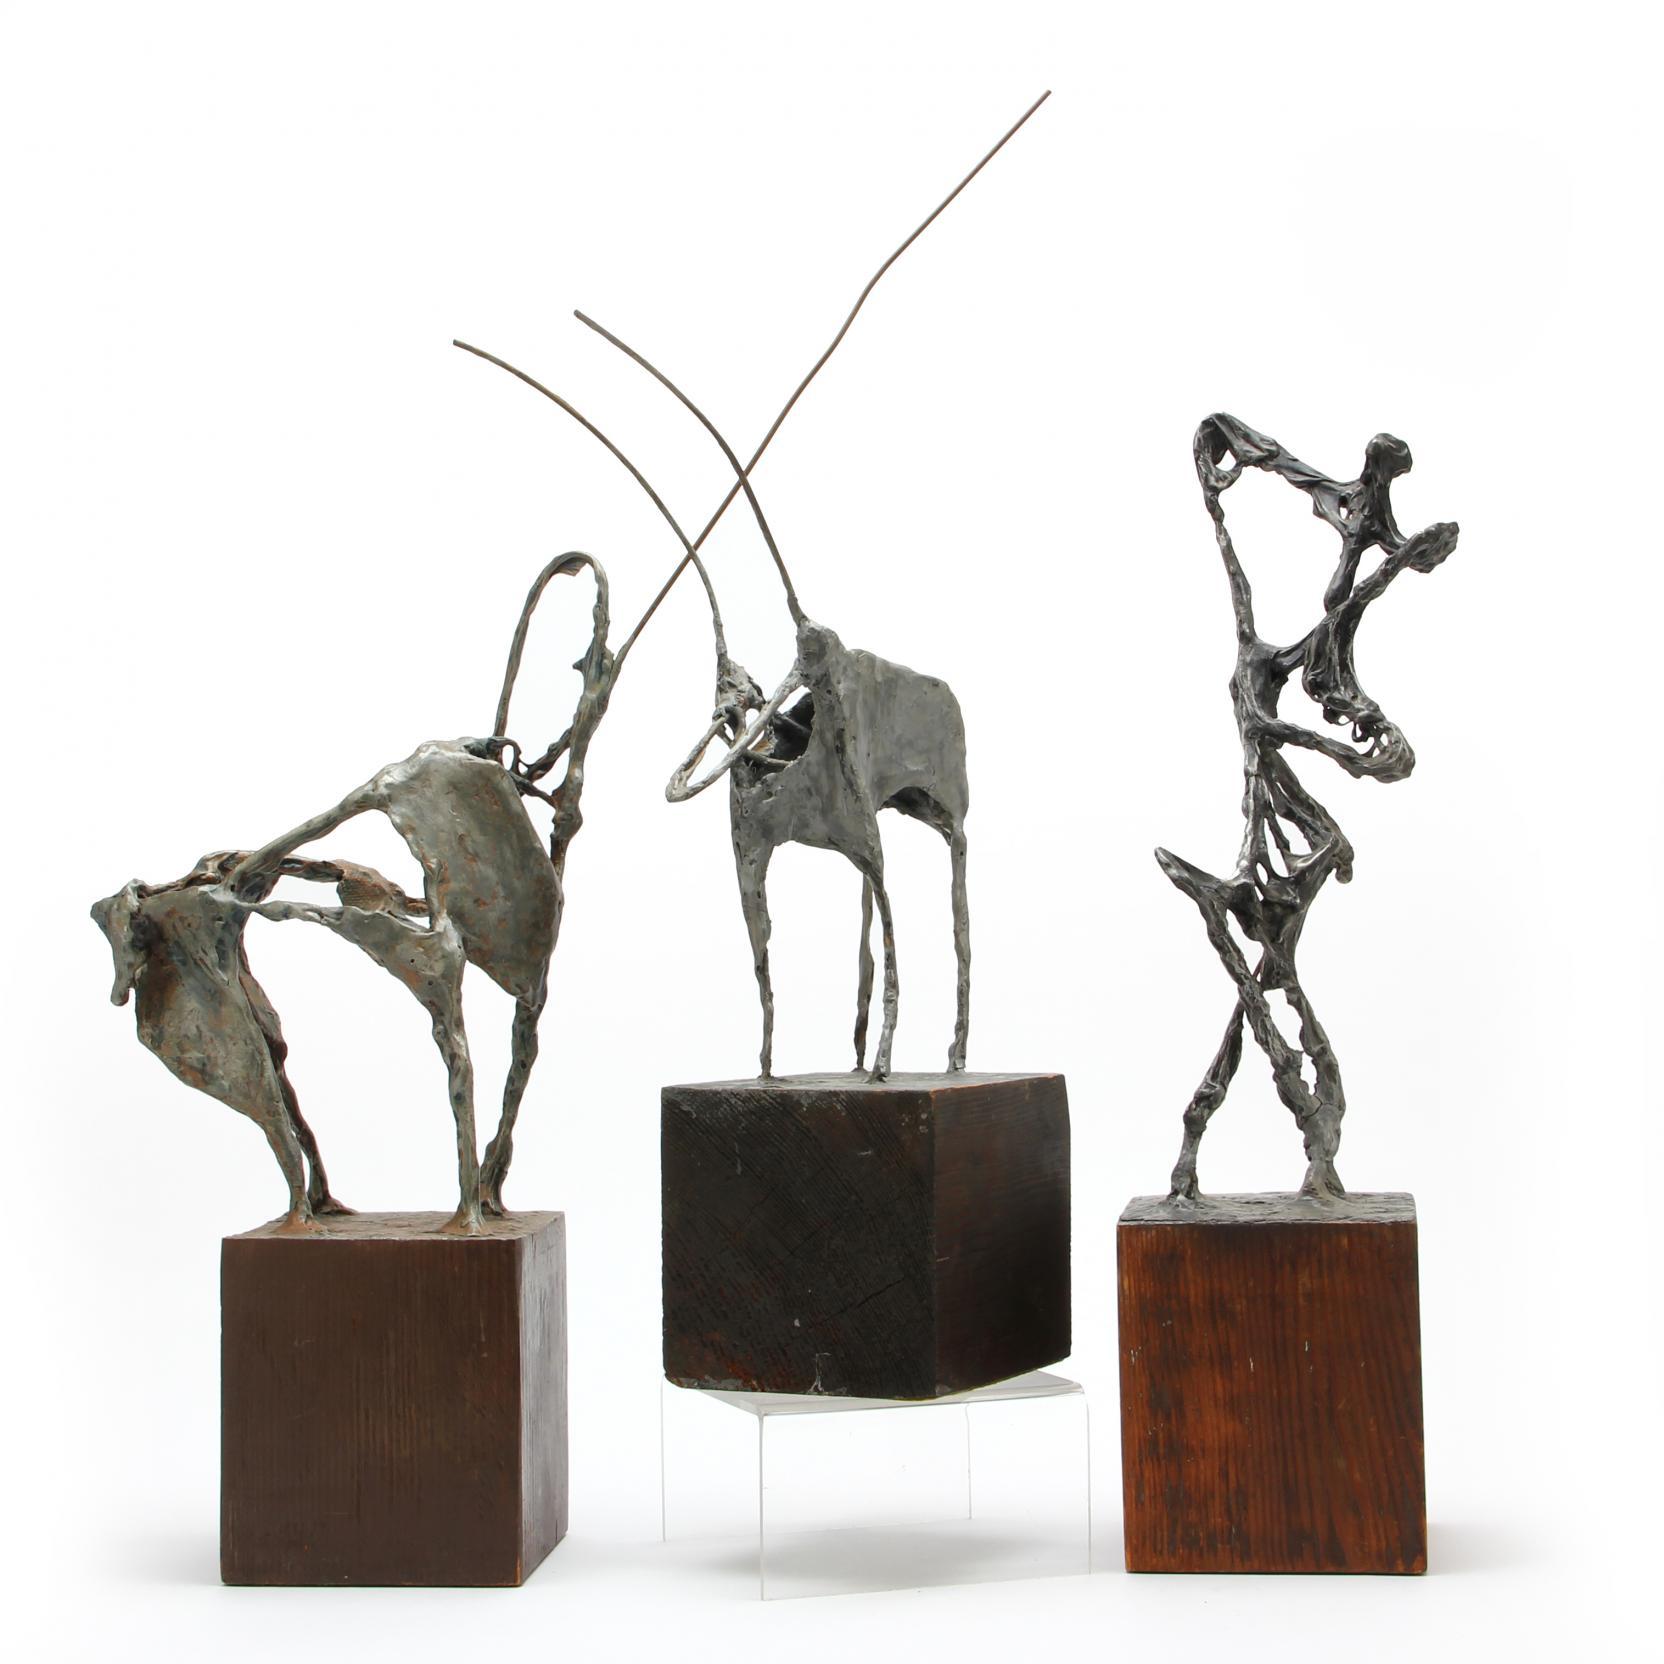 att-ray-fink-az-1922-1988-three-modern-sculptures